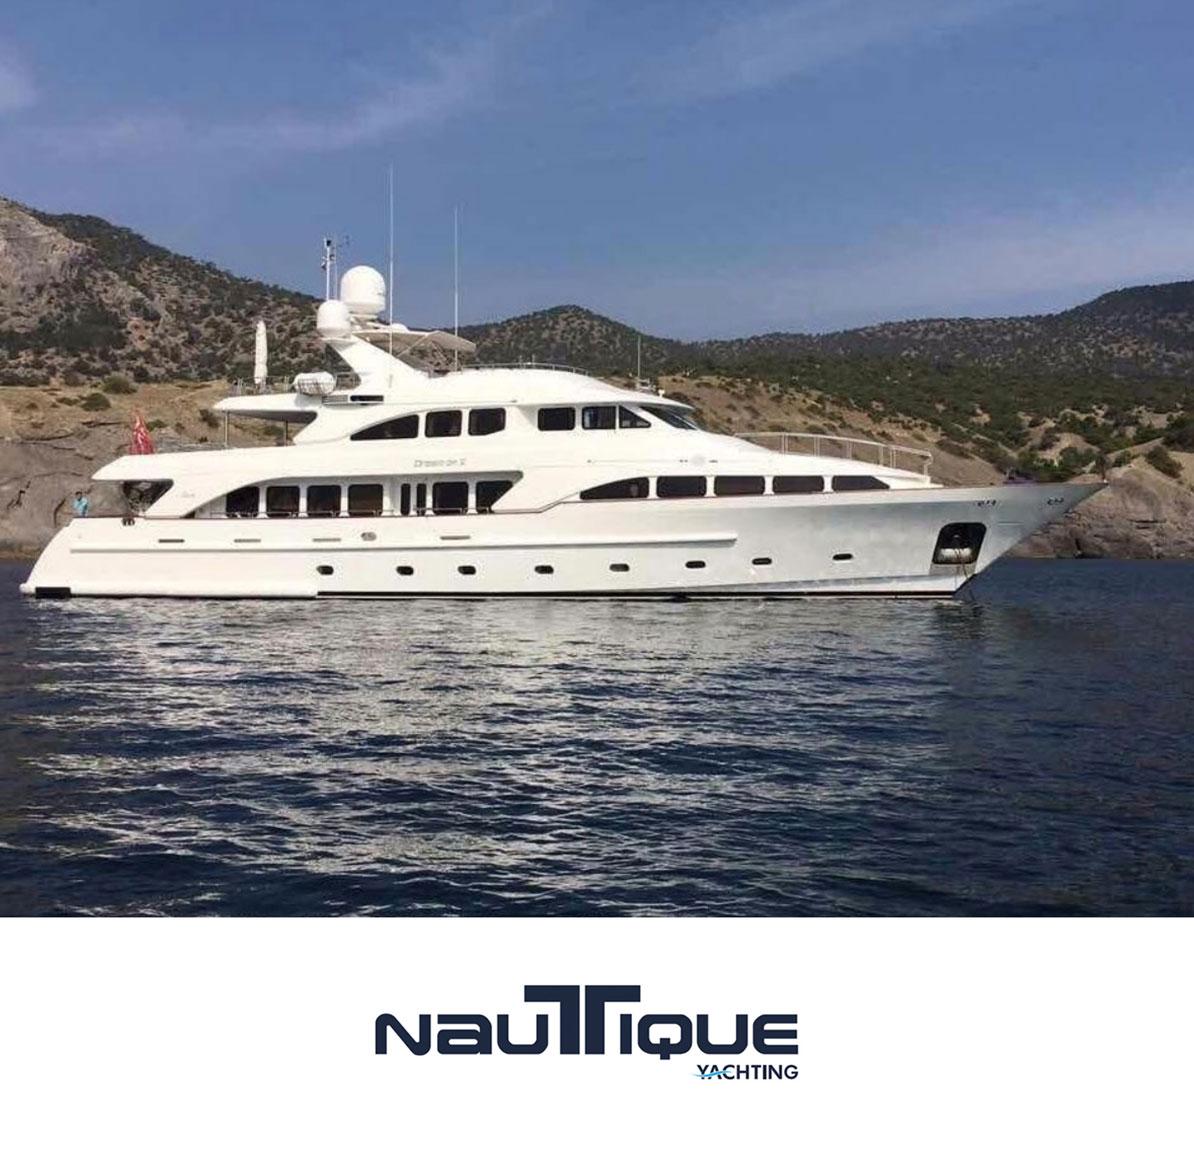 Nautique Yachting